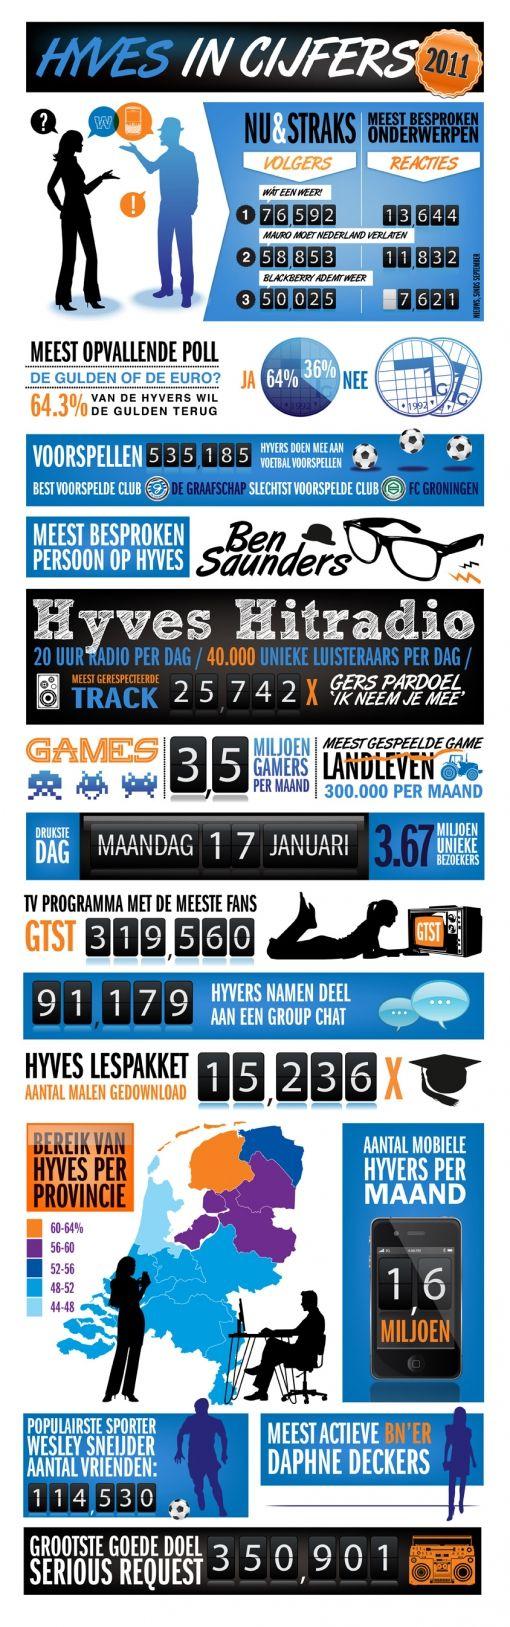 hyves-2011